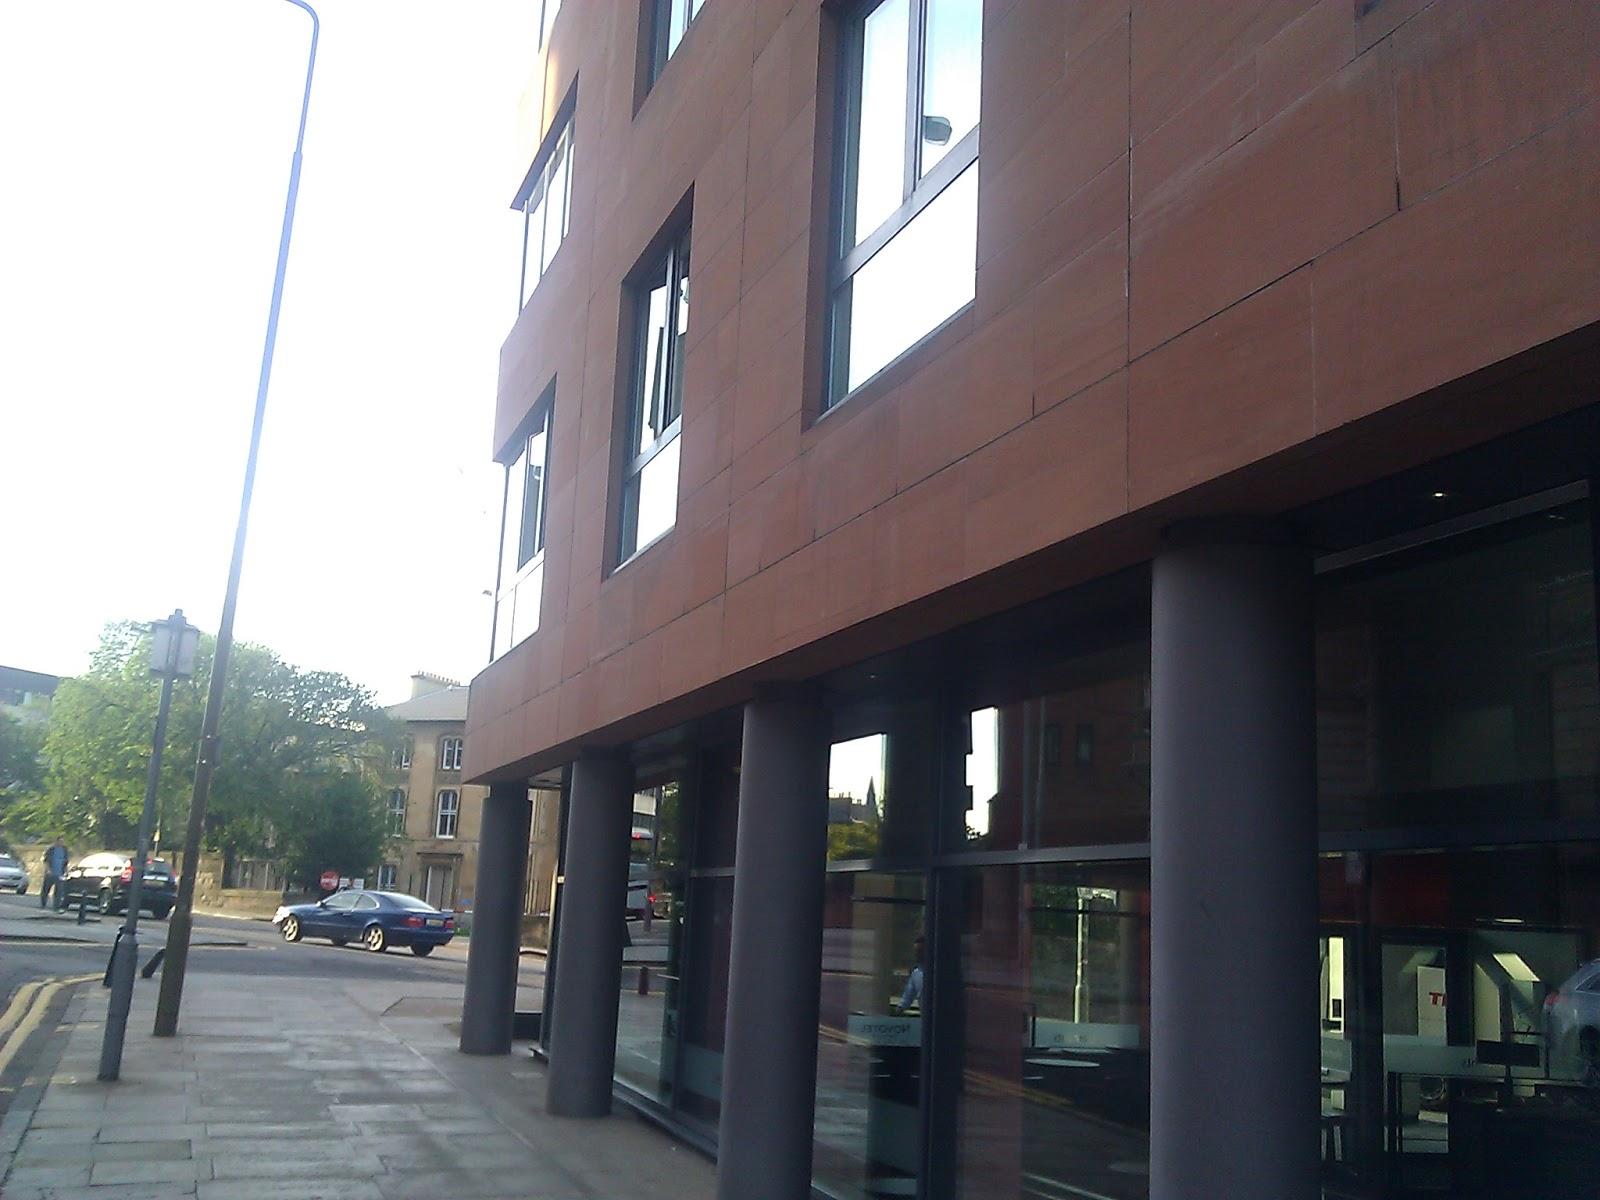 blog lunch novotel edinburgh centre edinburgh scotland. Black Bedroom Furniture Sets. Home Design Ideas